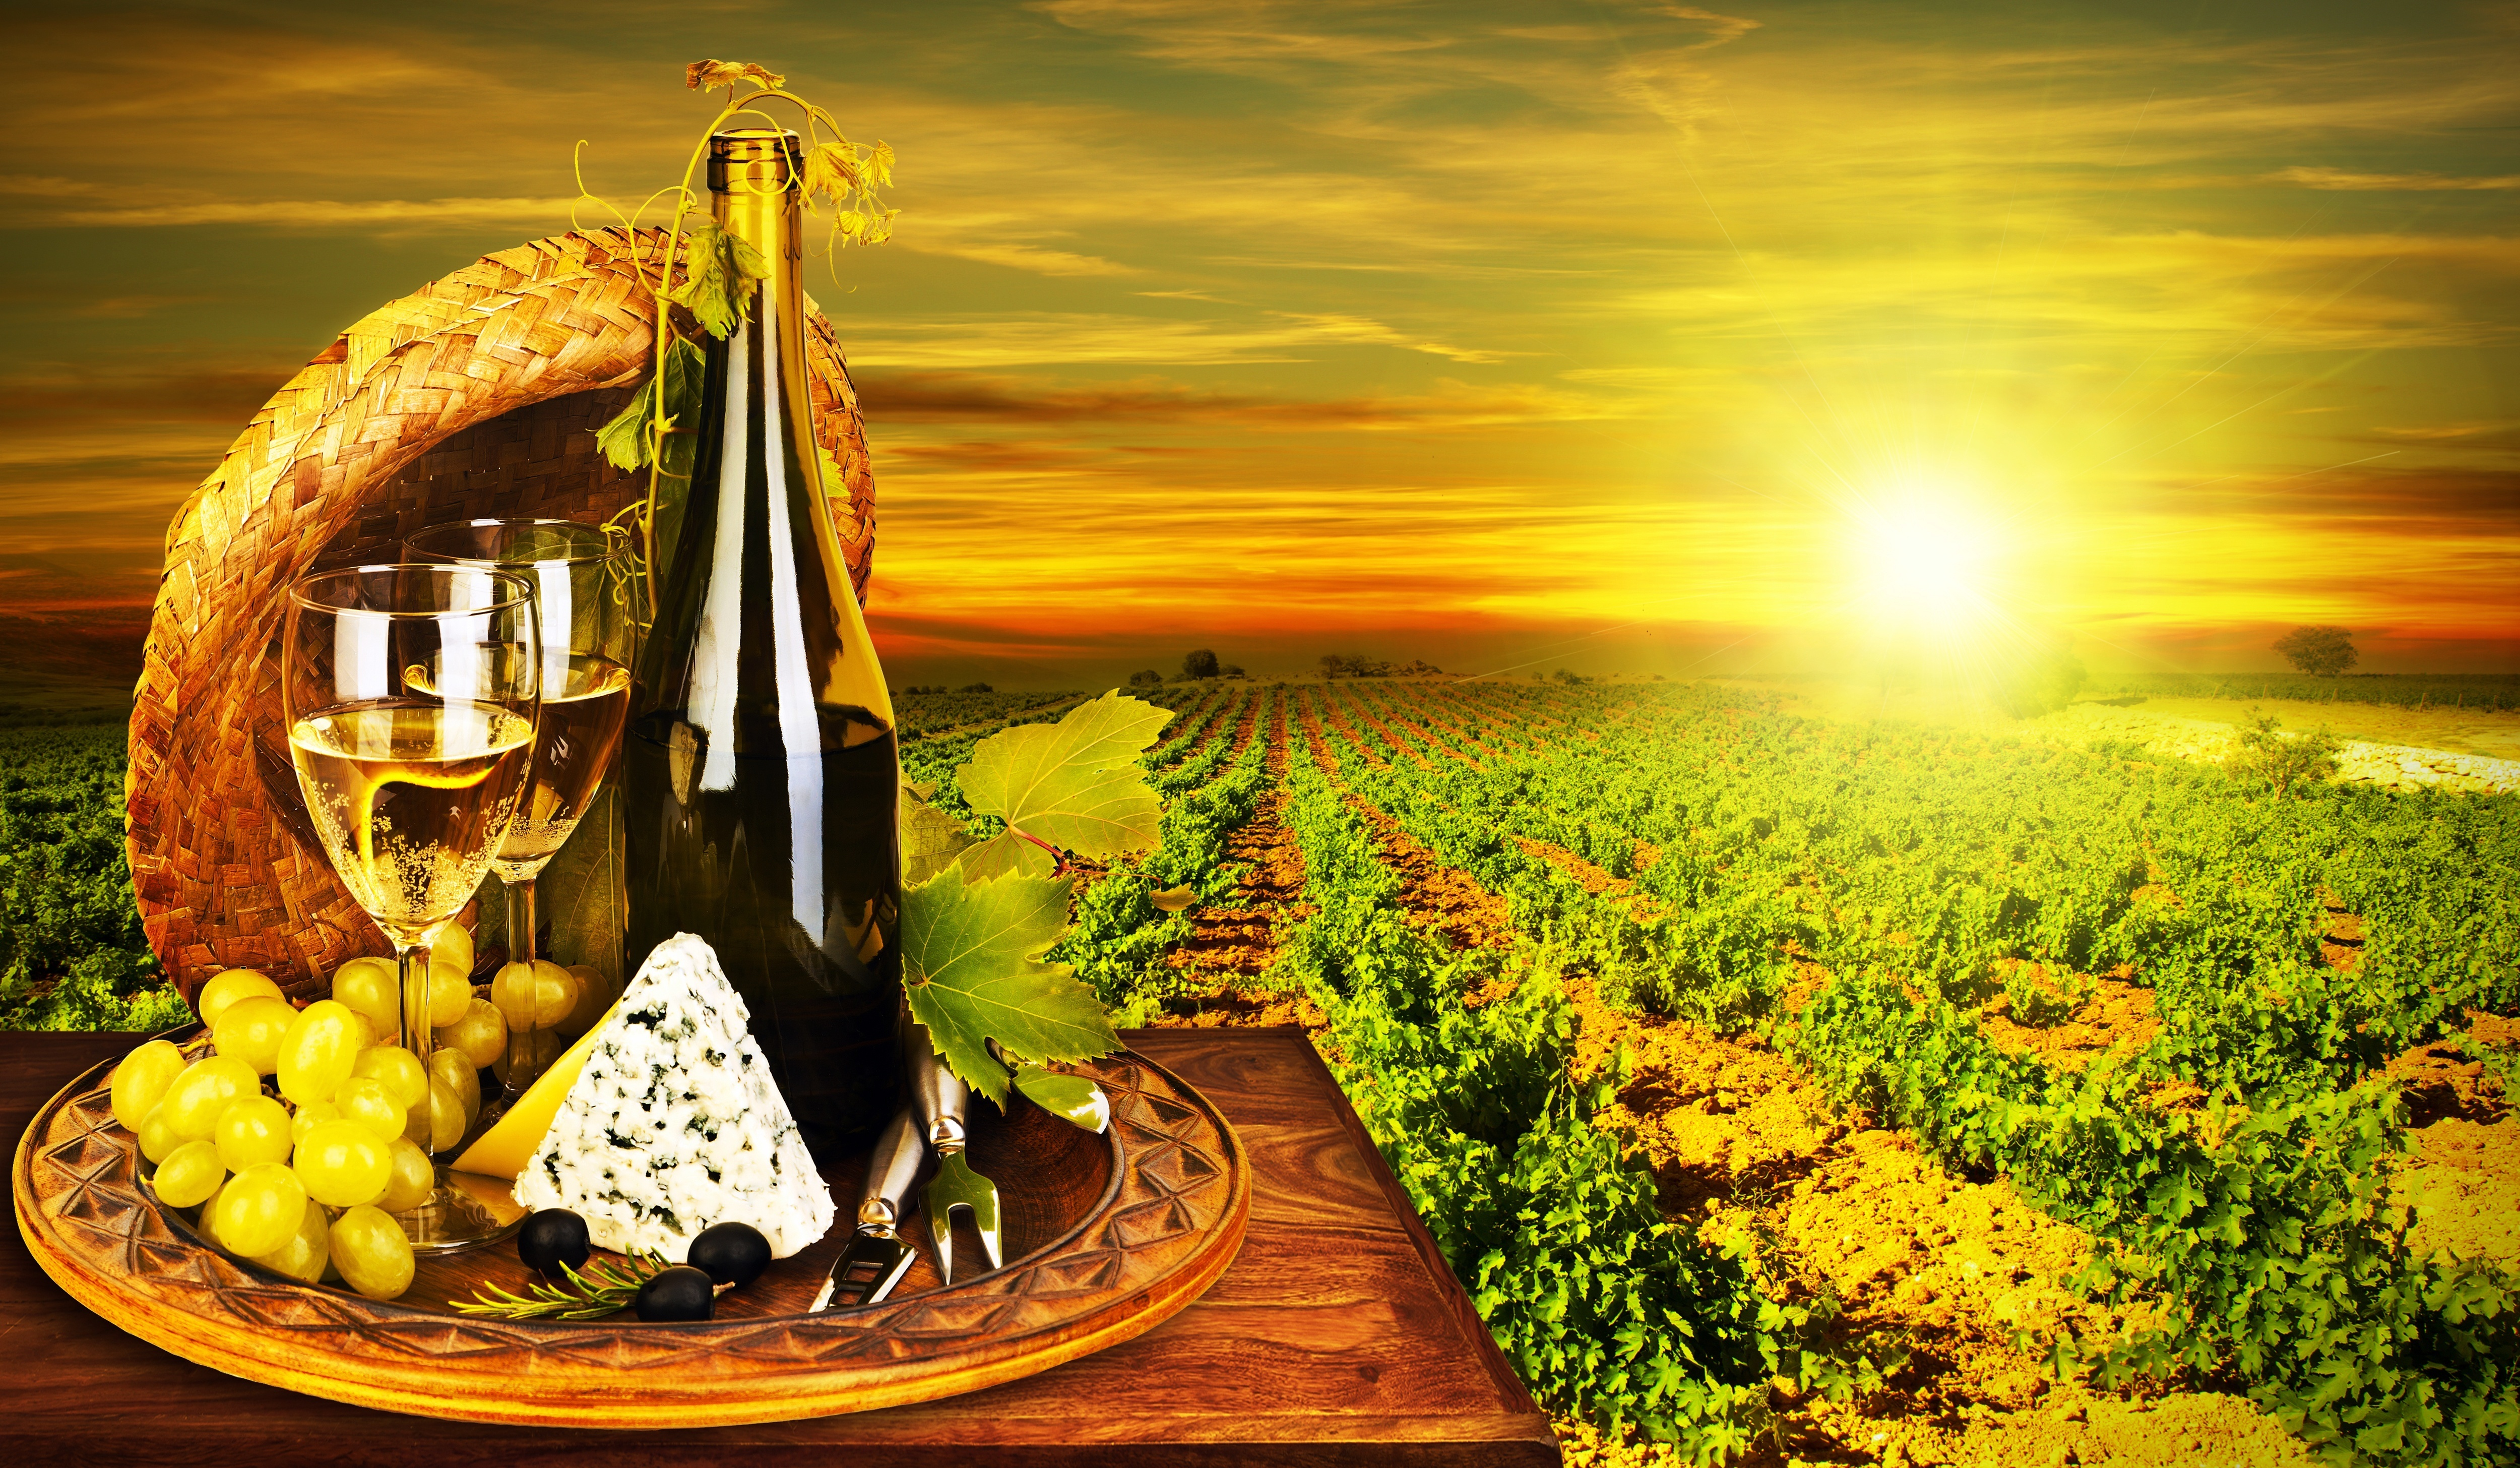 Food - Wine White Wine Grapes Bottle Cheese Dor Blue Vineyard Sun ...: wall.alphacoders.com/big.php?i=291131